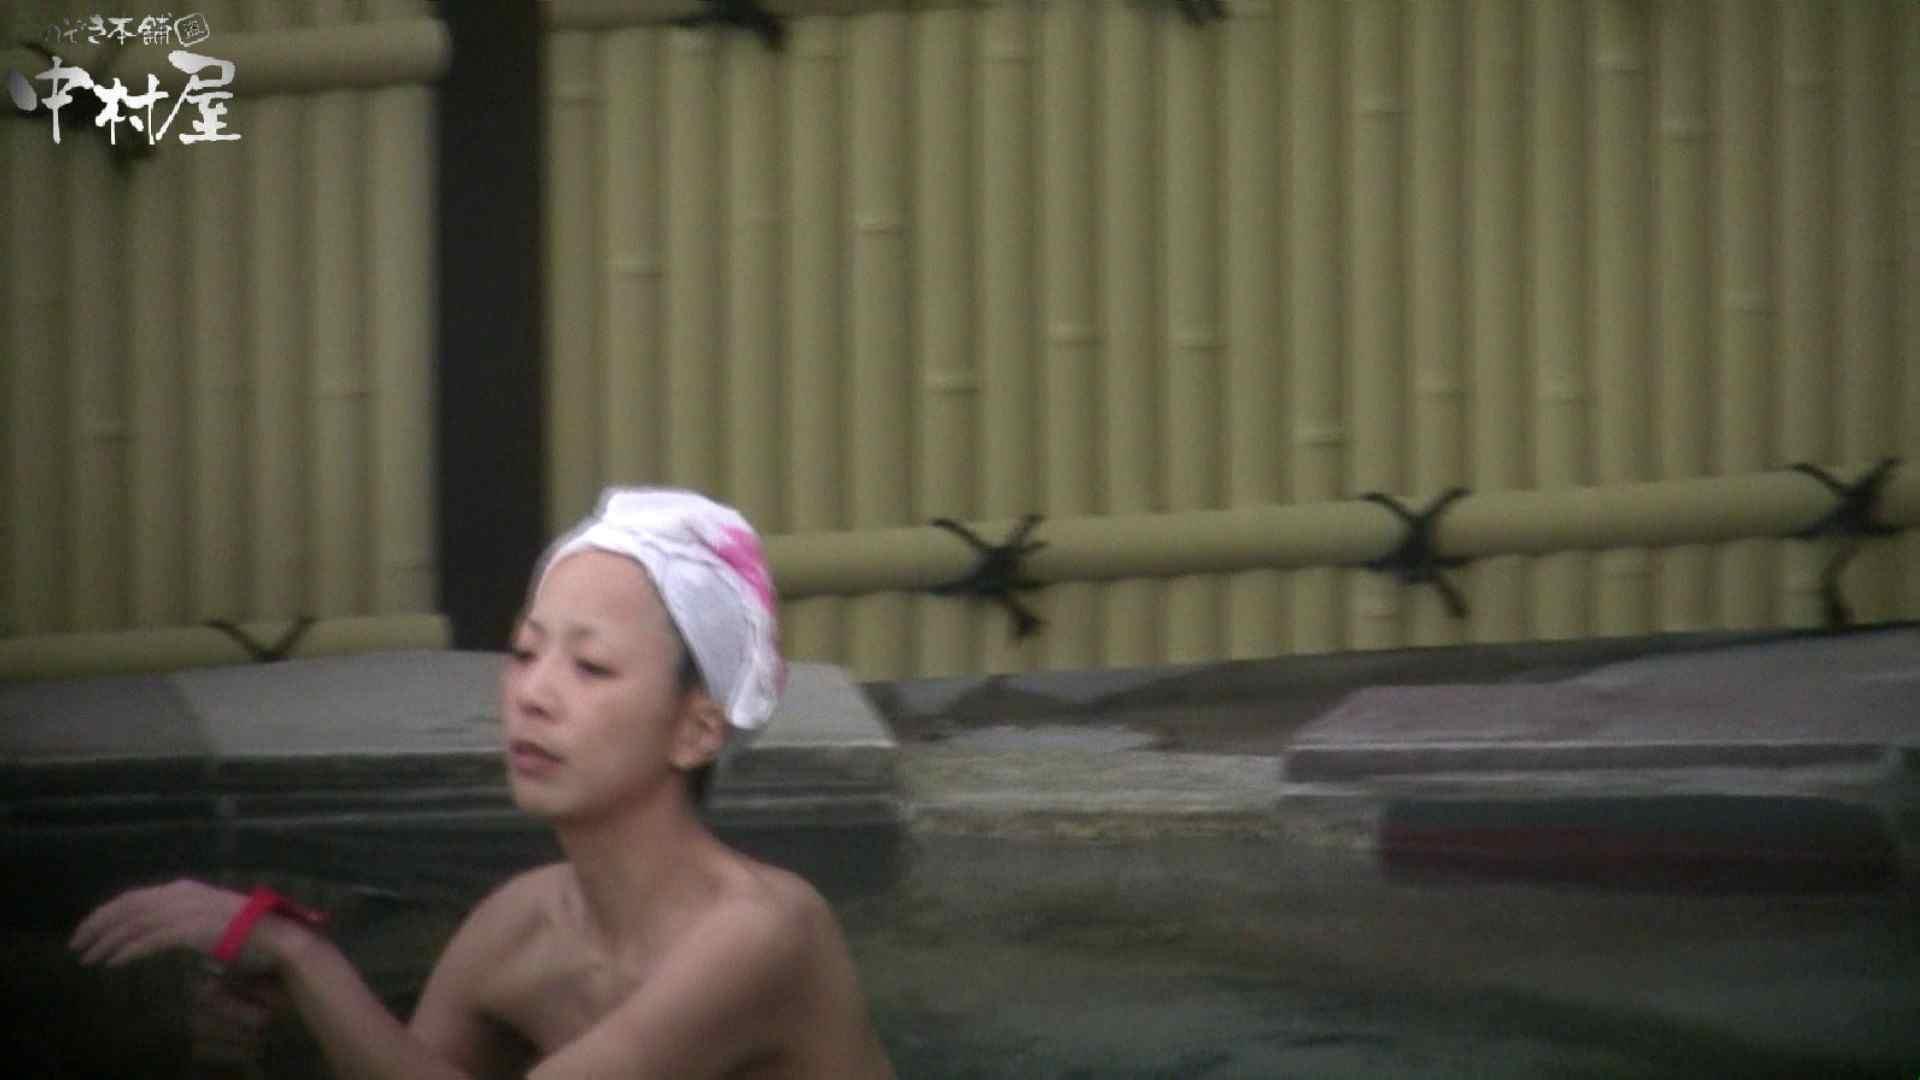 Aquaな露天風呂Vol.929 0  21連発 8